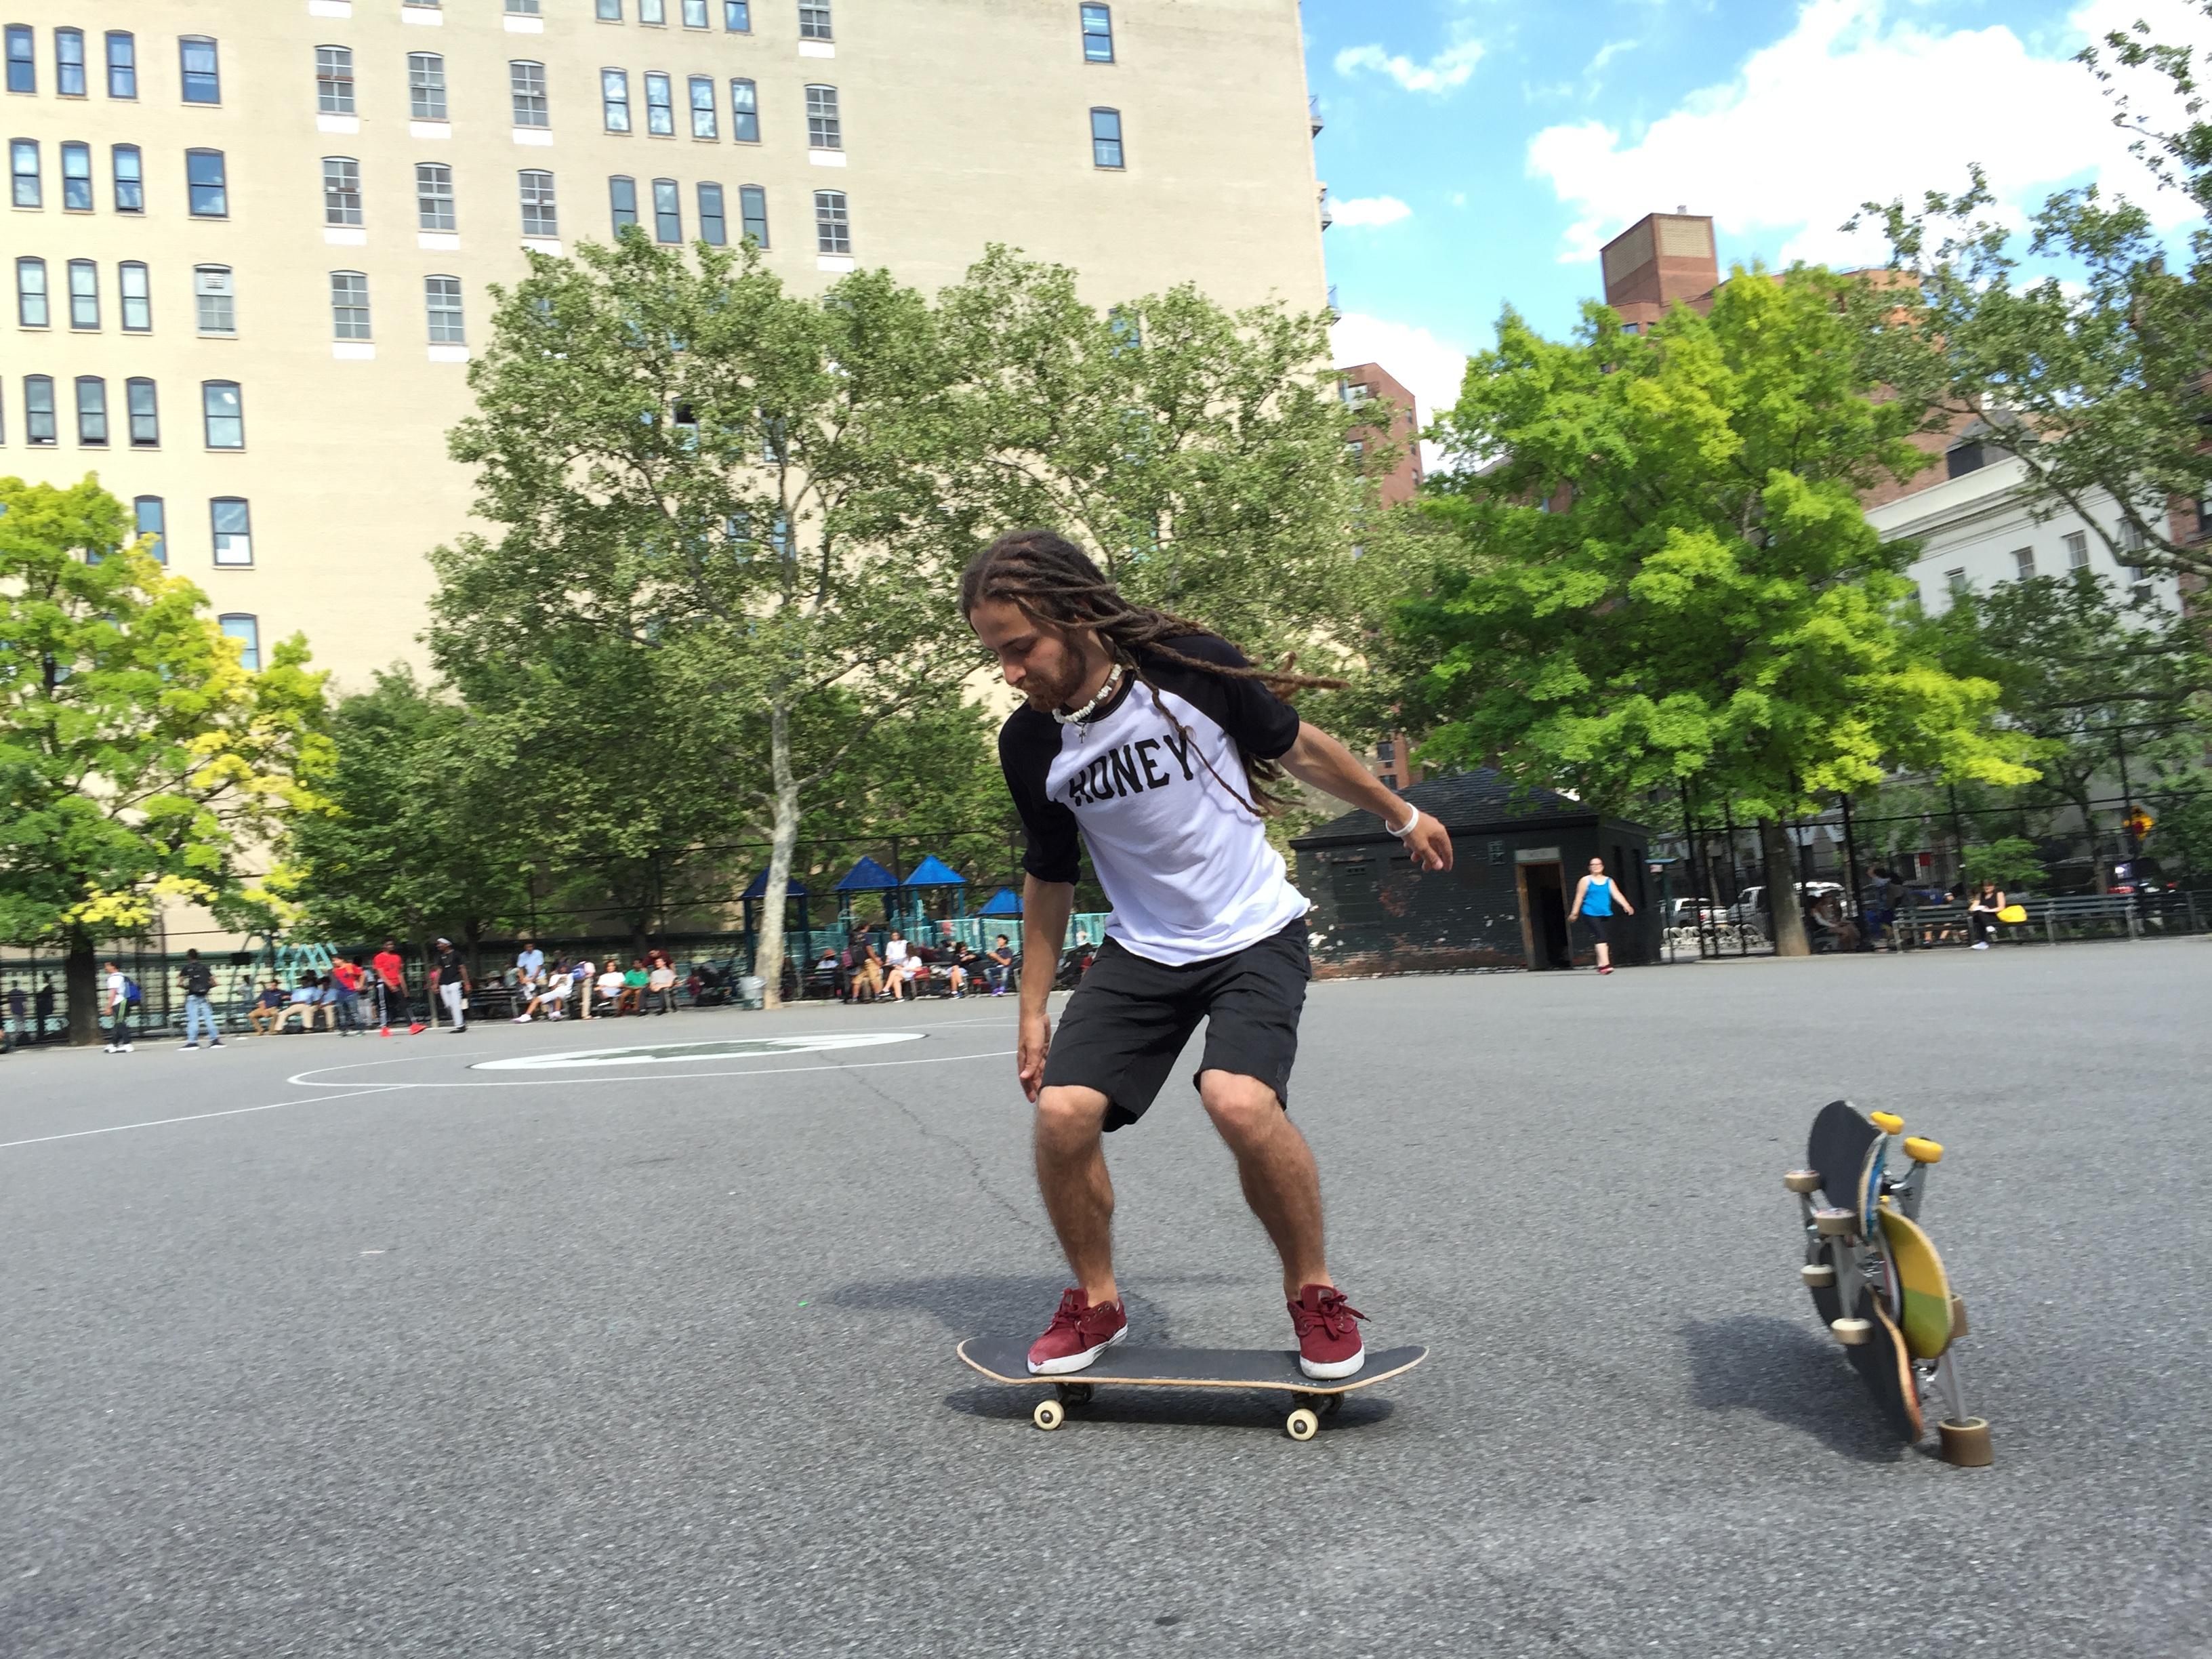 skateboard_learn_to_ollie_10